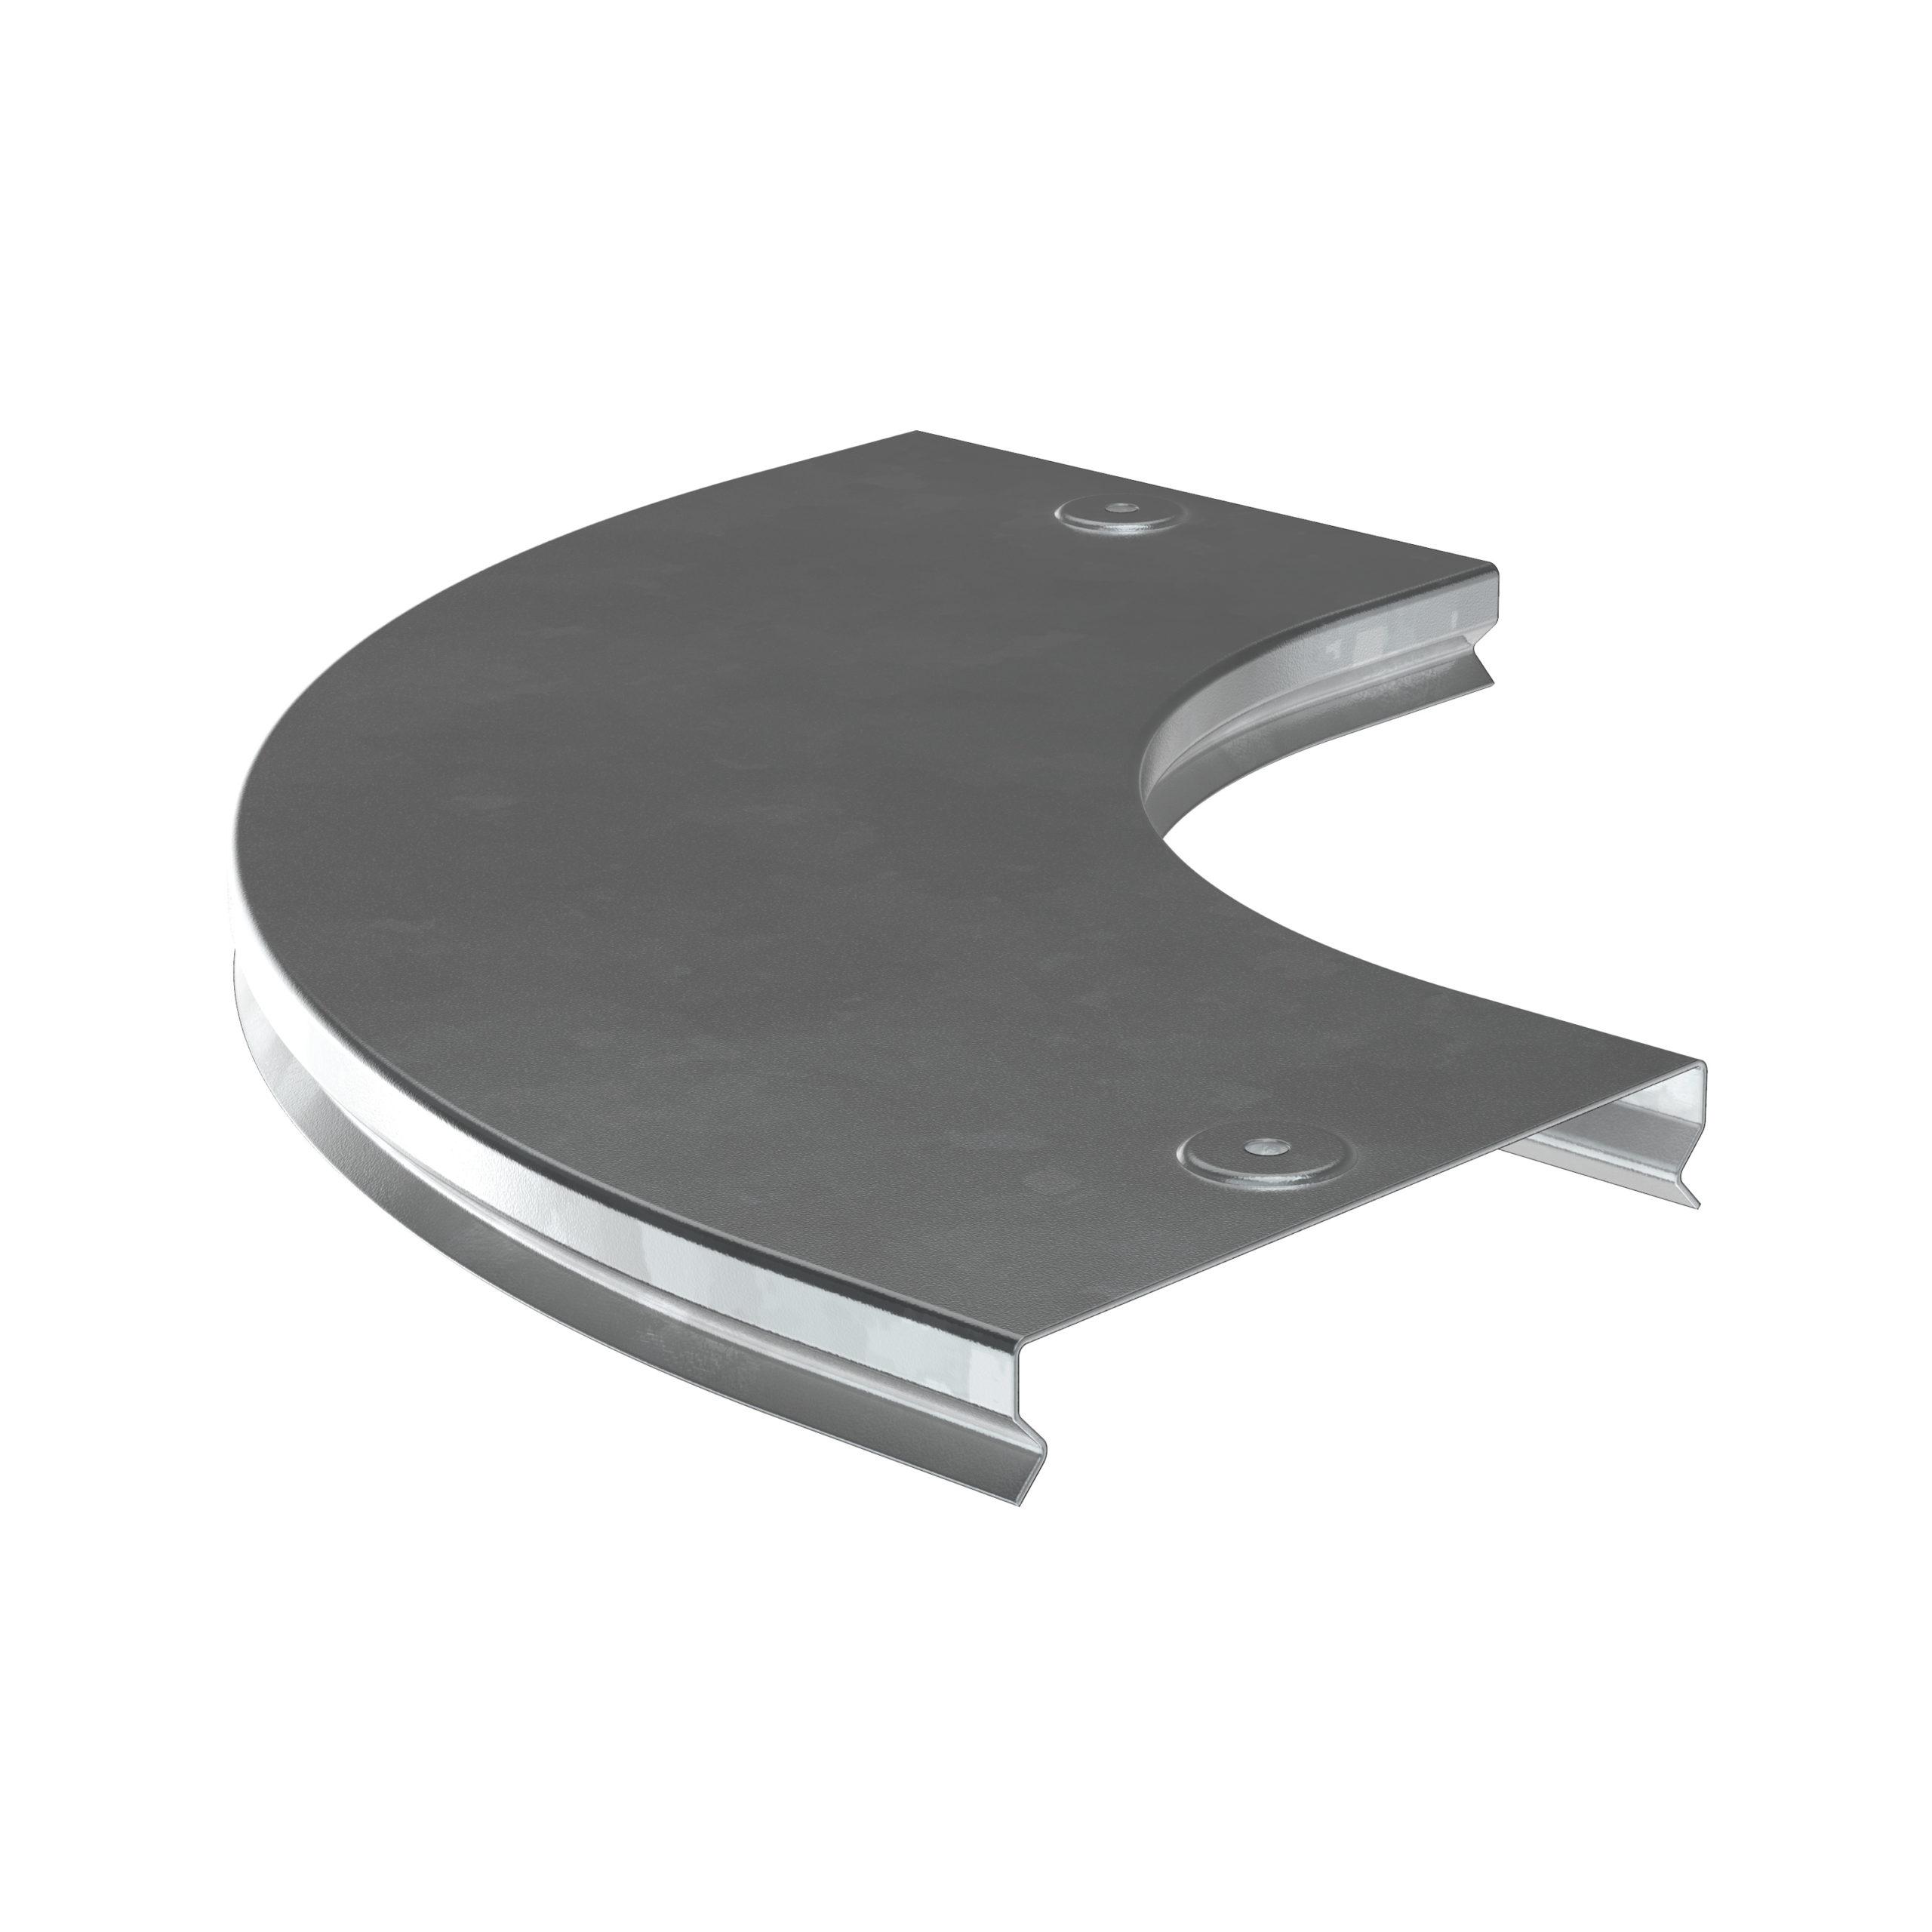 Крышка поворота плавного 90град (тип Г01) ESCA 80мм HDZ IEK 1